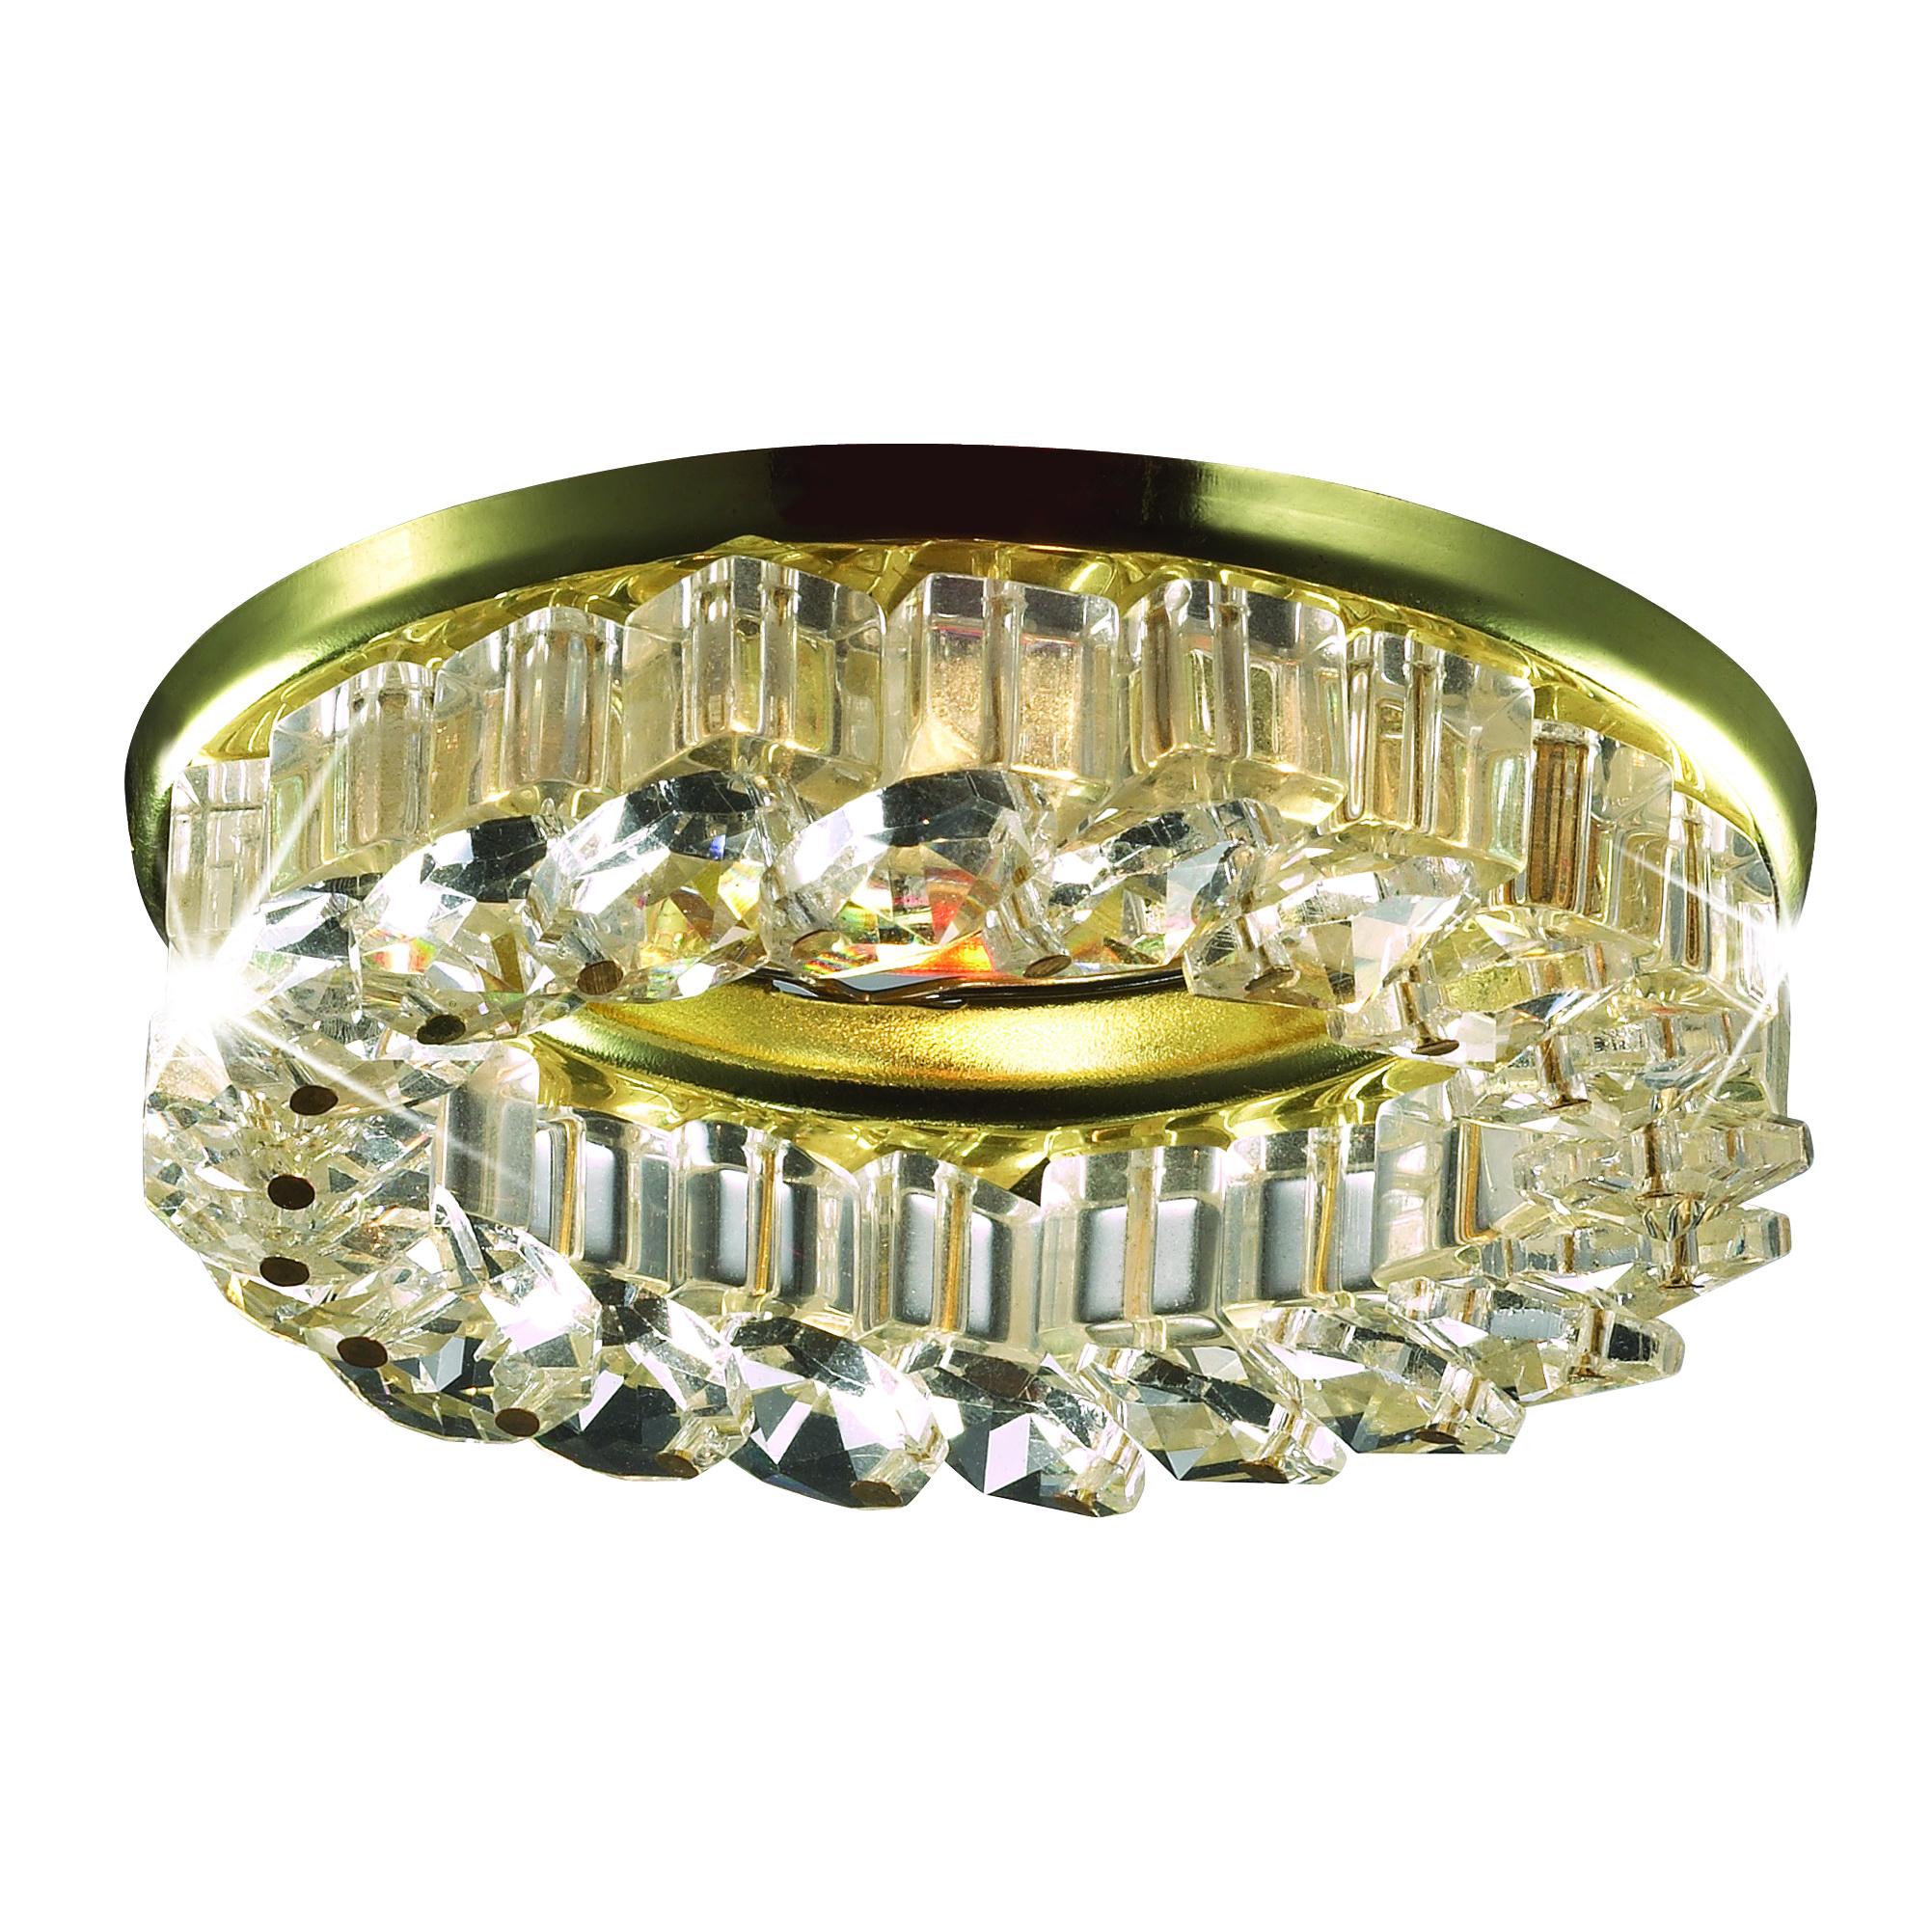 Светильник встраиваемый NovotechСветильники встраиваемые<br>Стиль светильника: модерн,<br>Диаметр: 60,<br>Форма светильника: круг,<br>Материал светильника: металл, хрусталь,<br>Количество ламп: 1,<br>Тип лампы: галогенная,<br>Мощность: 50,<br>Патрон: GX5.3,<br>Цвет арматуры: золото,<br>Назначение светильника: для комнаты<br>